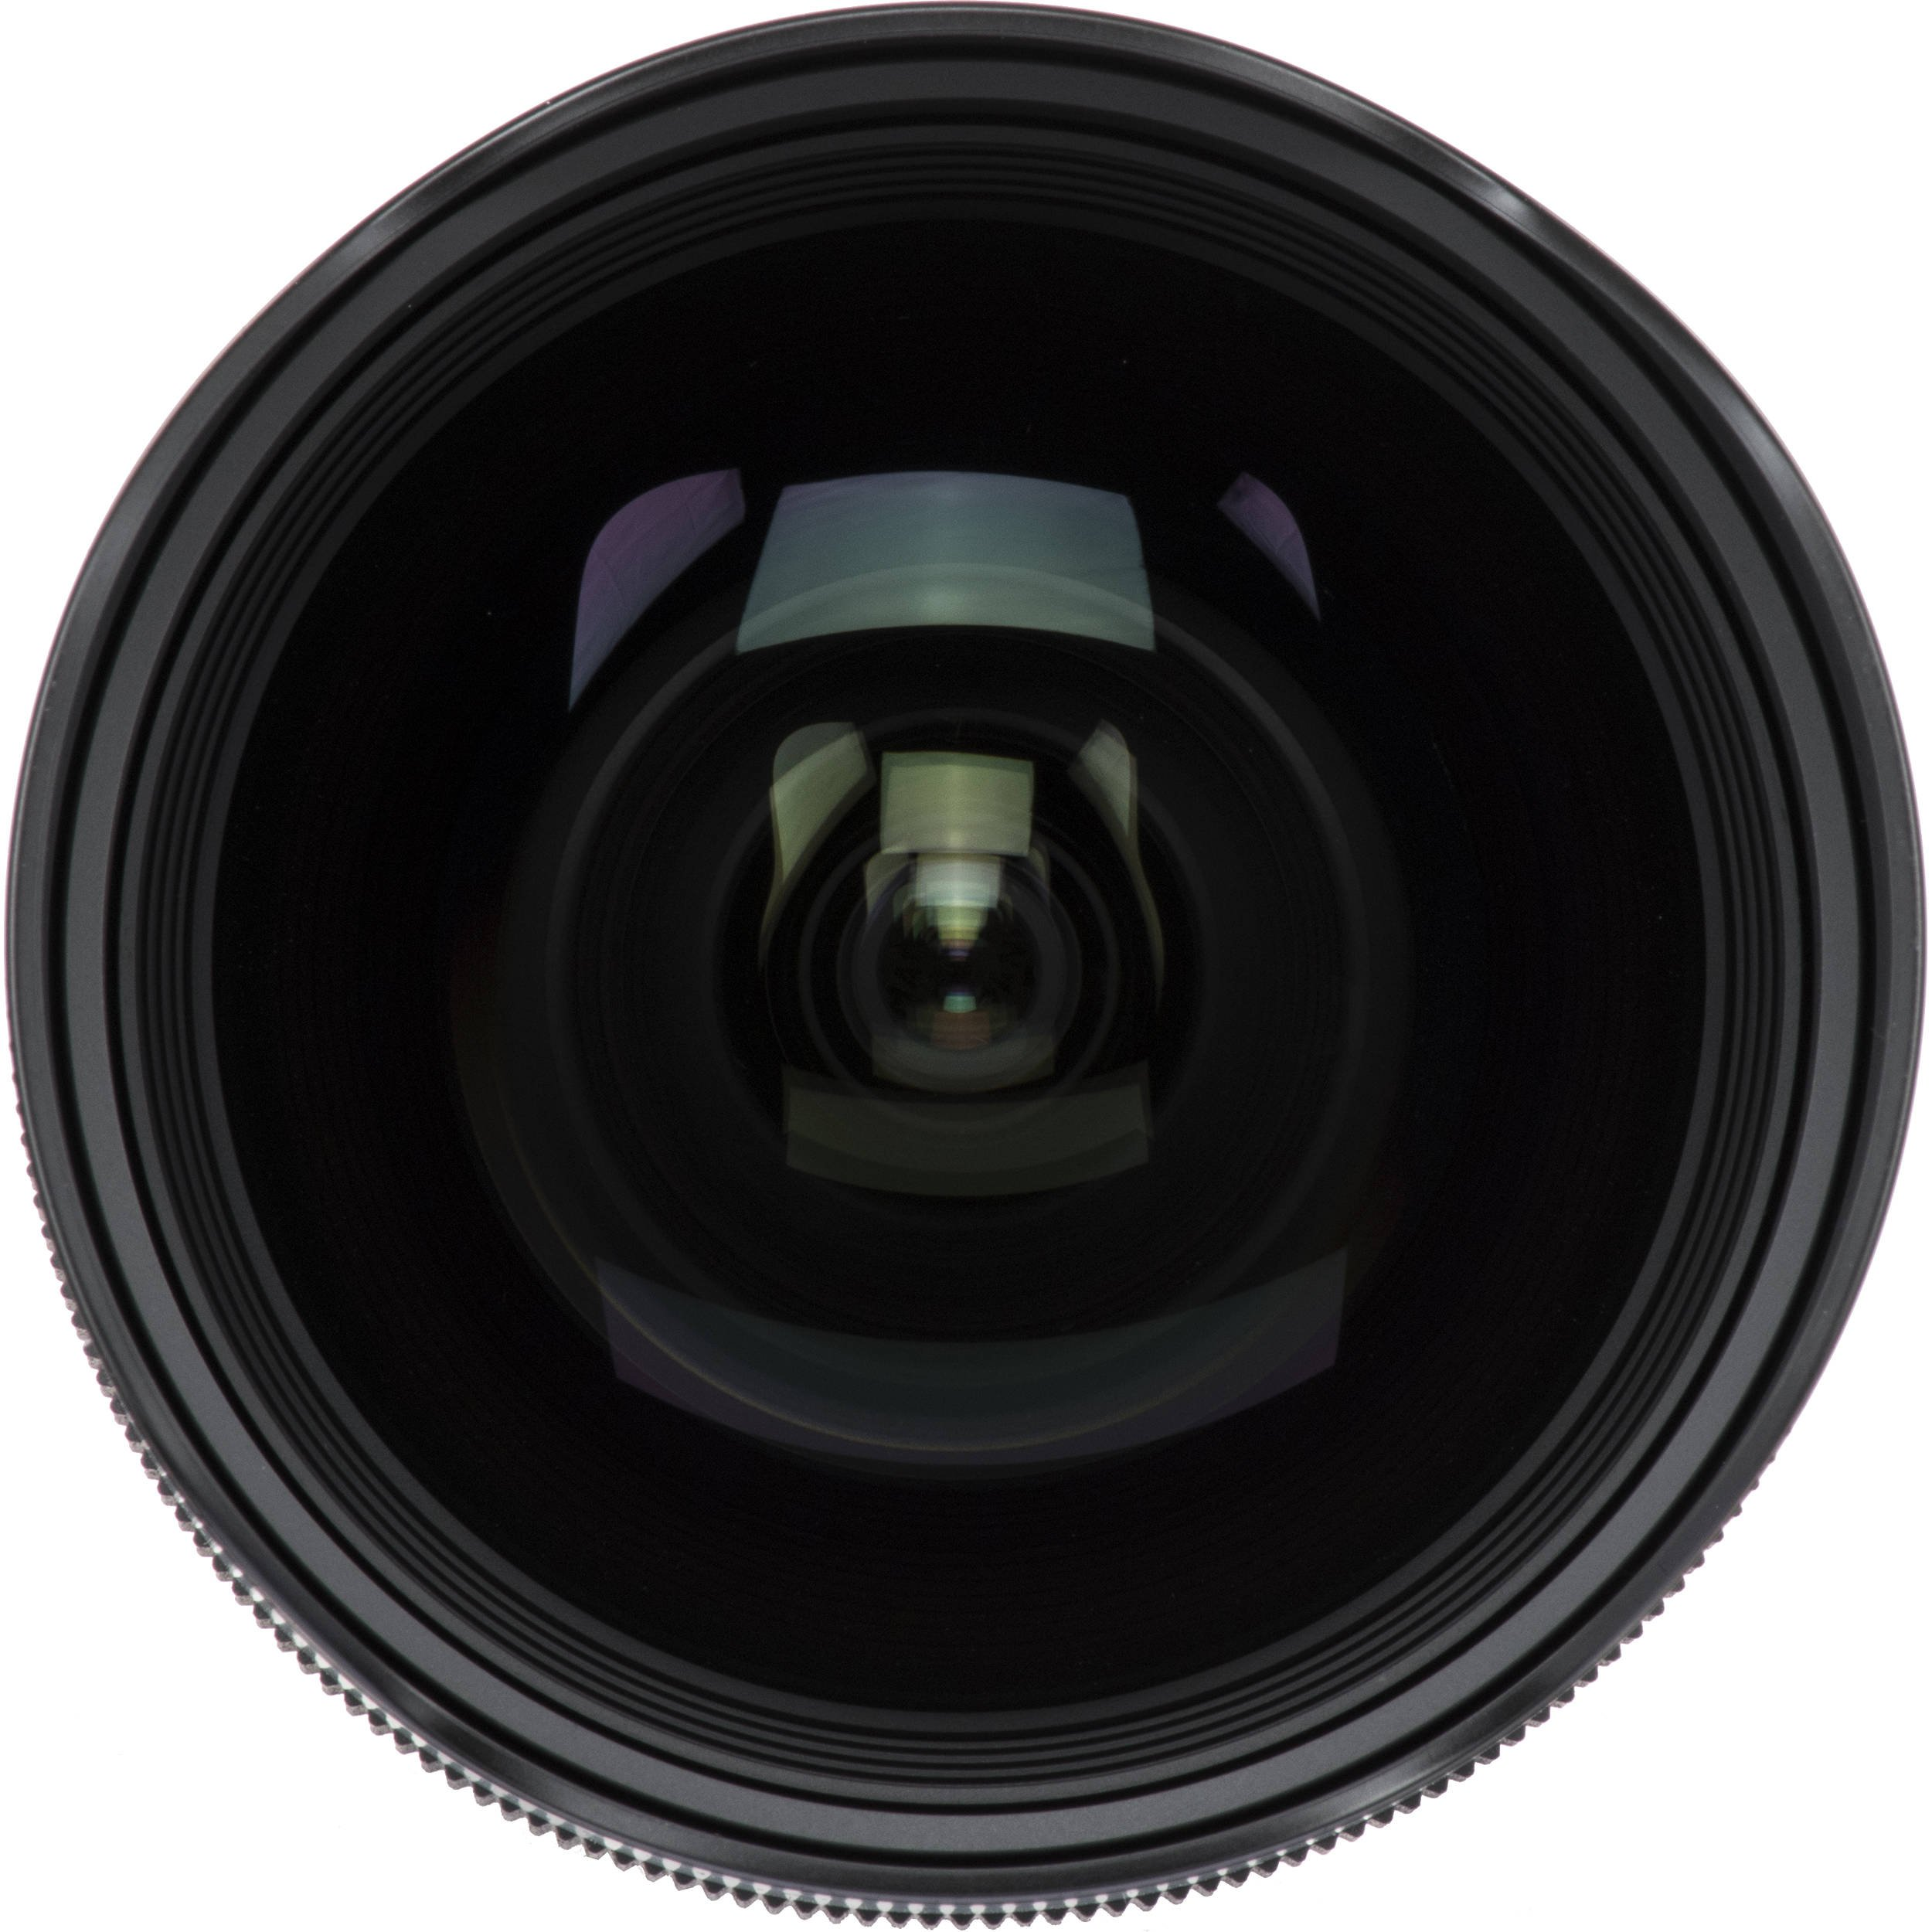 Sigma 14-24mm f/2.8 DG HSM Art Lens for Nikon F – 6PC Accessory Bundle by Sigma (Image #7)